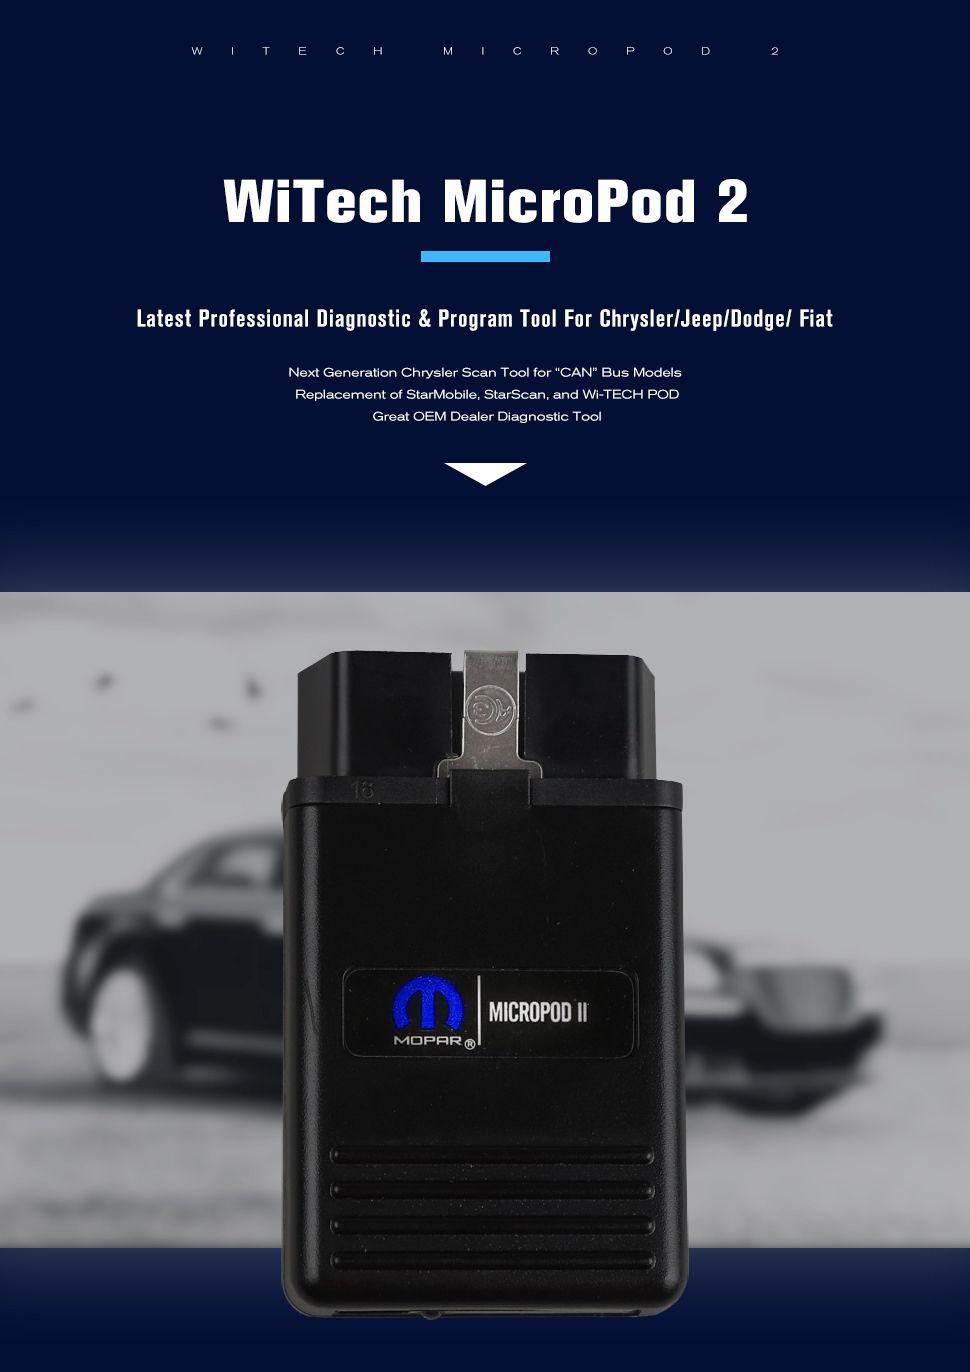 Witech Micropod ii VCI Chrysler Witech Micropod II Clone